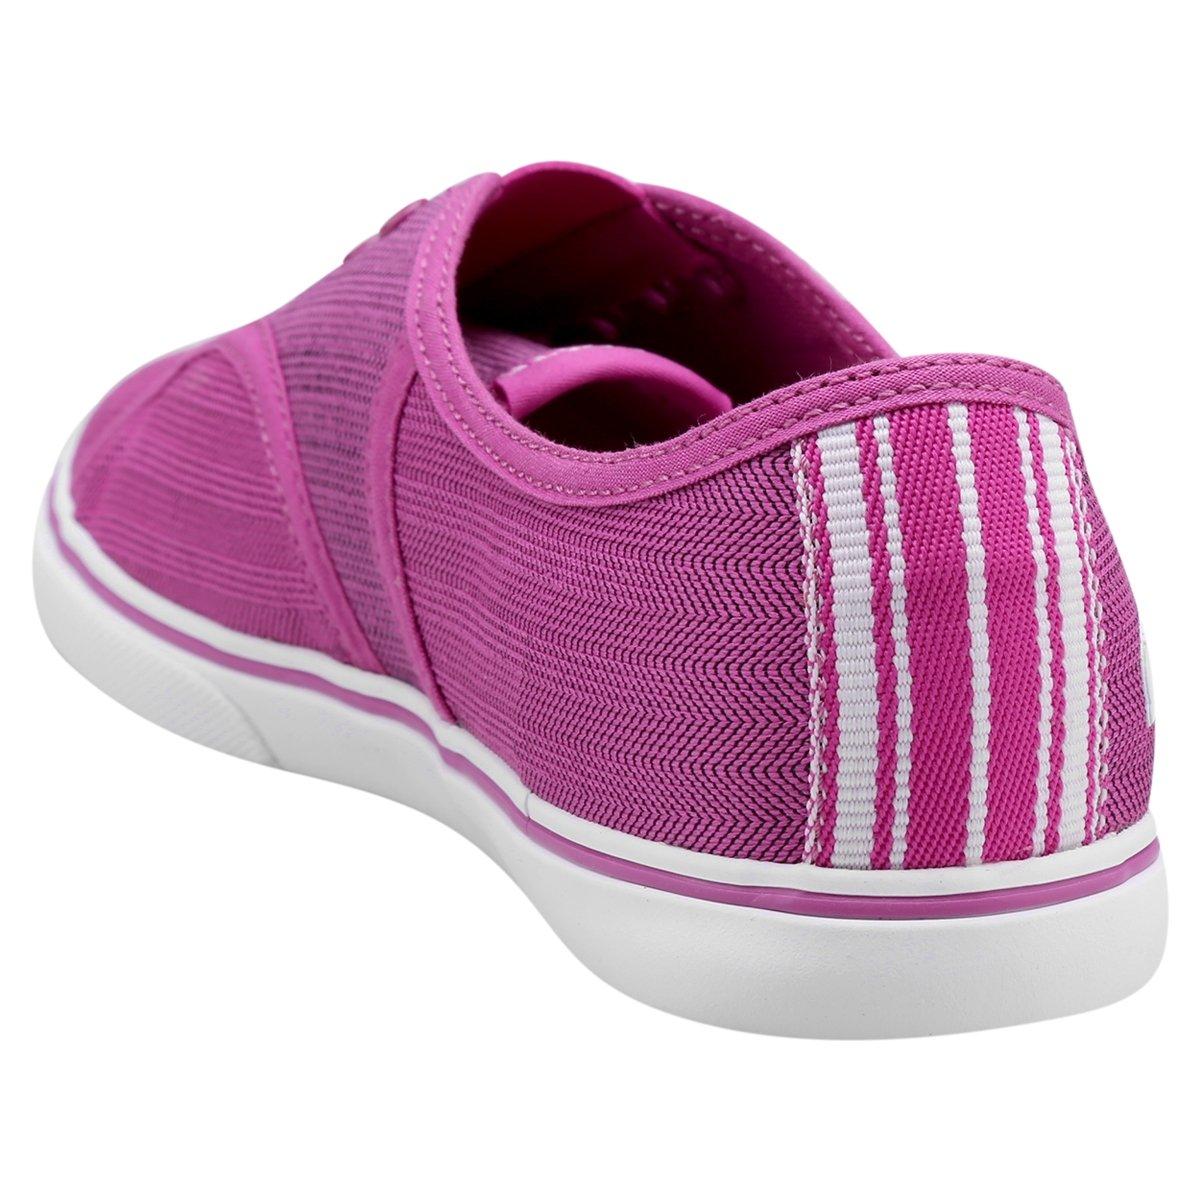 Lacoste Tênis Rene Pink Hpc Lacoste e Sleek Tênis Sleek Slip Rene Slip Branco Hpc AYvqI4I